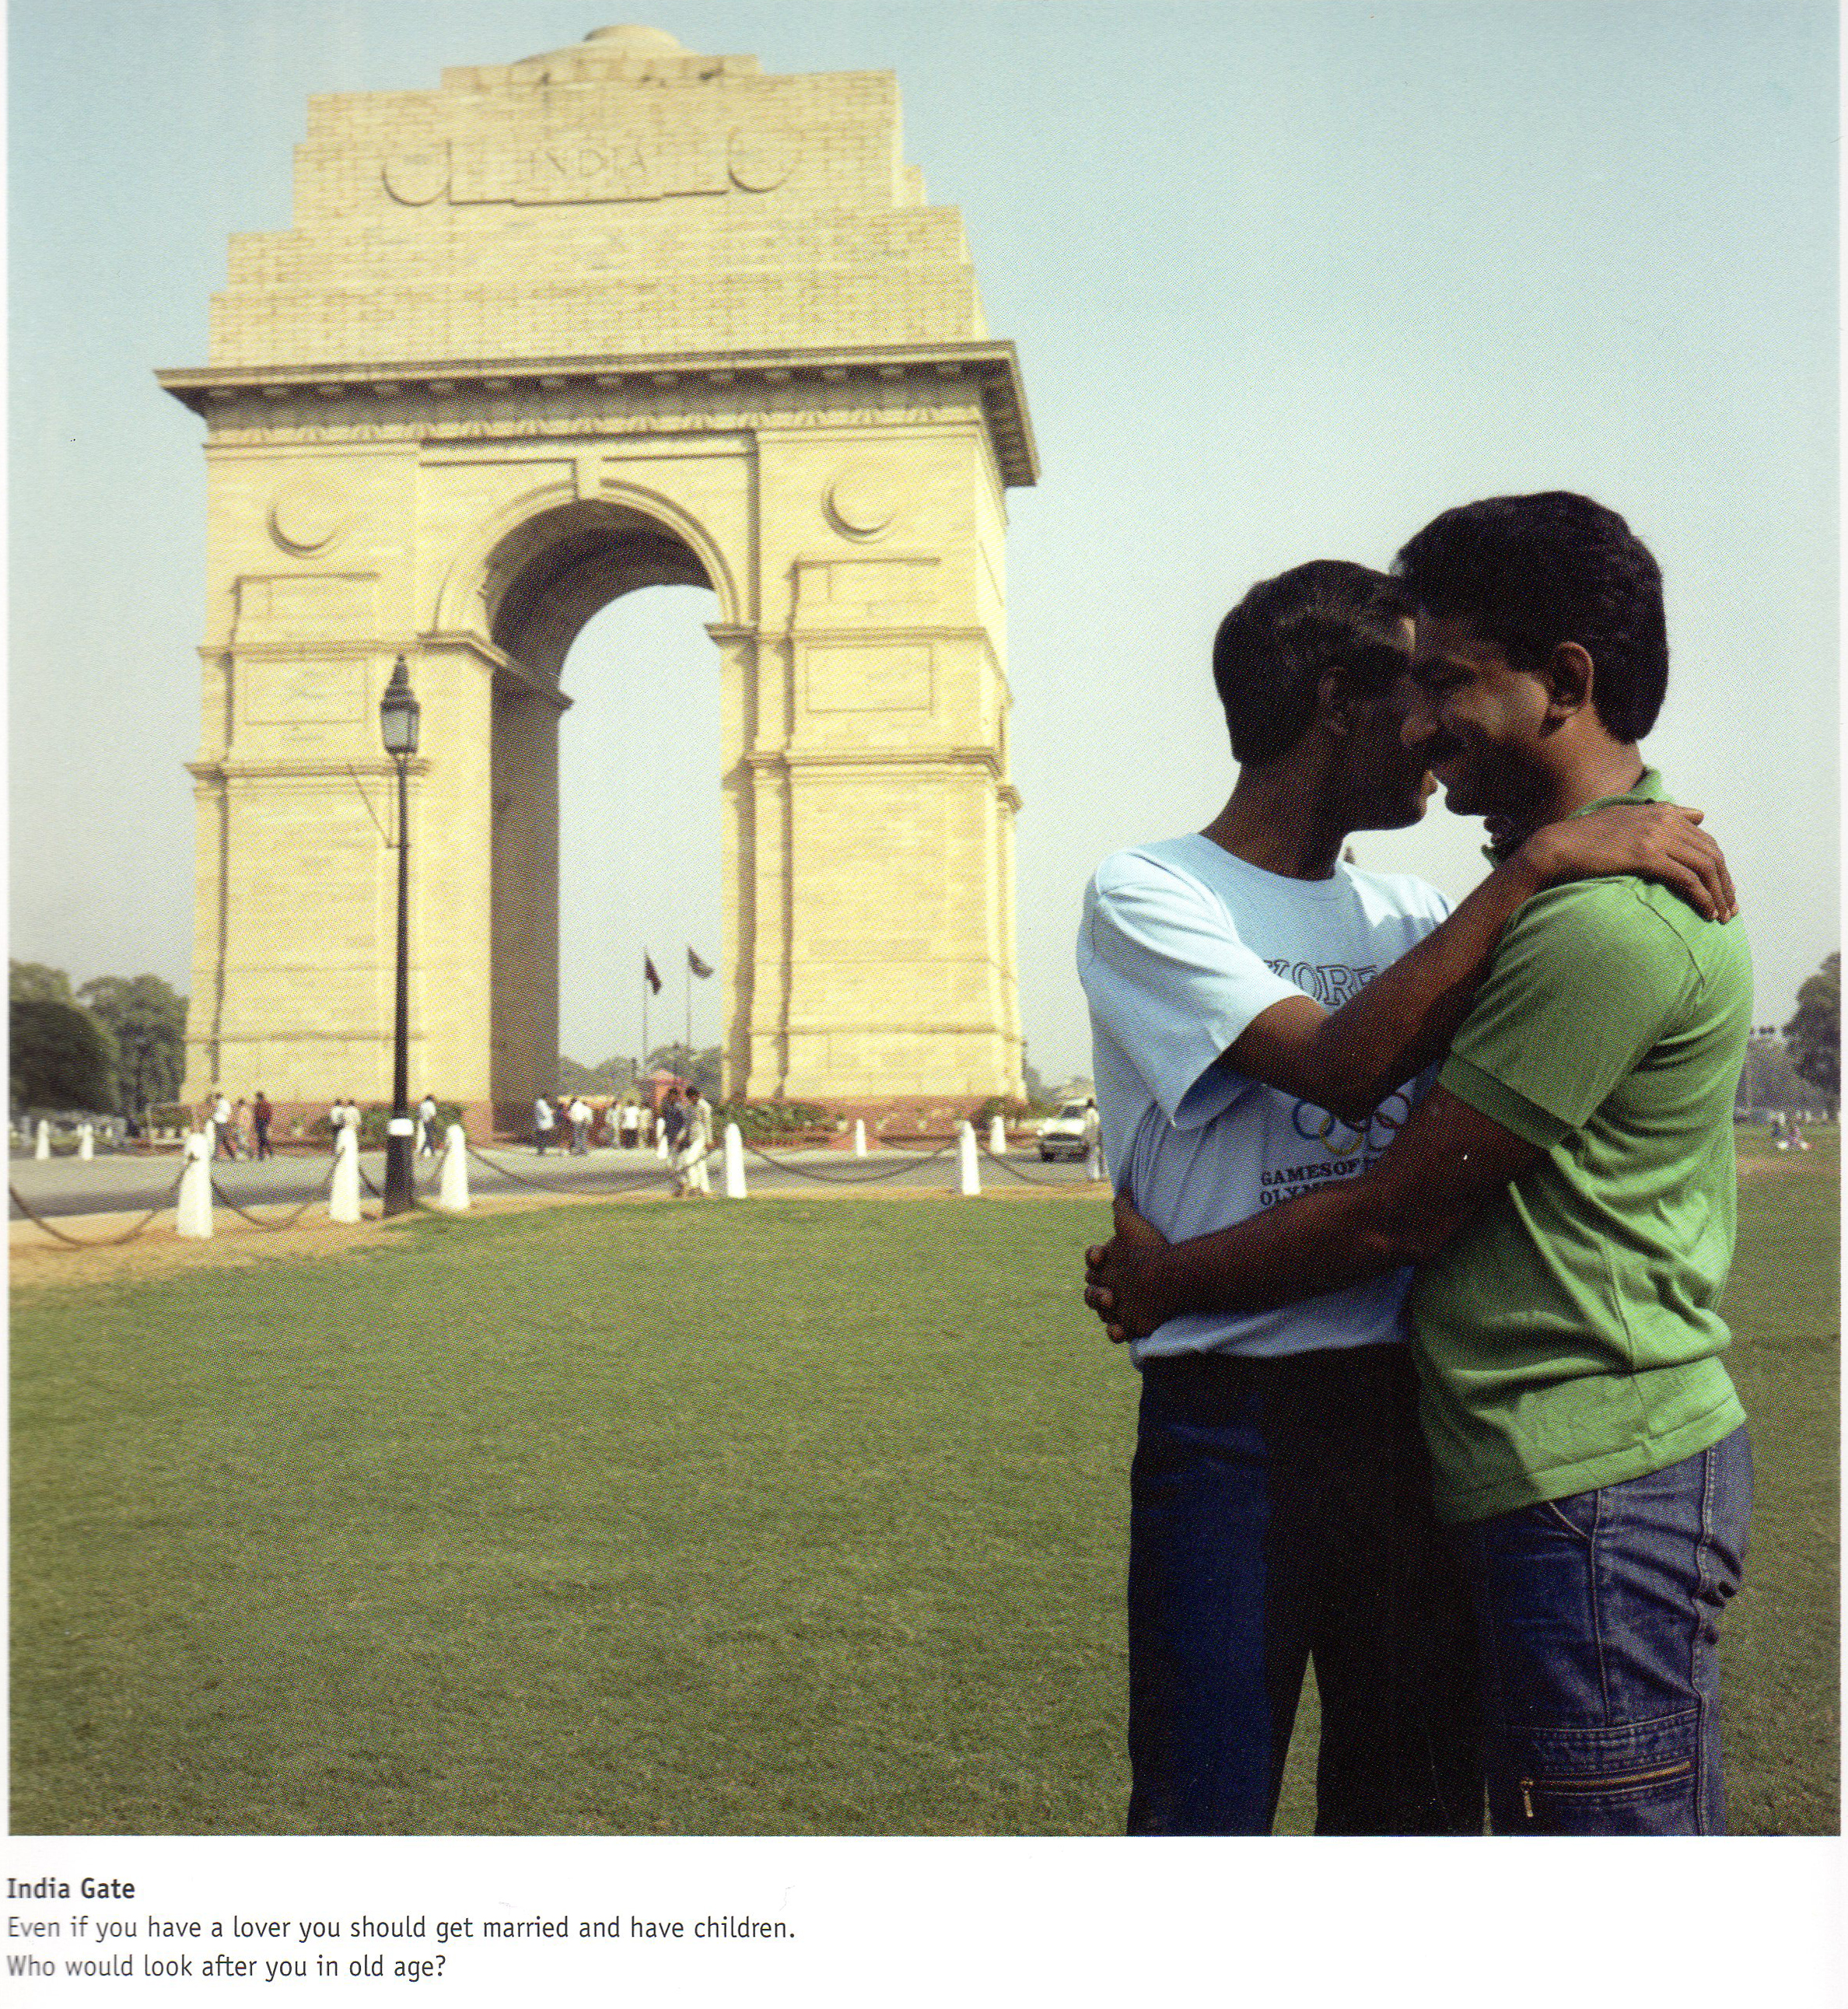 gupta_india_gate